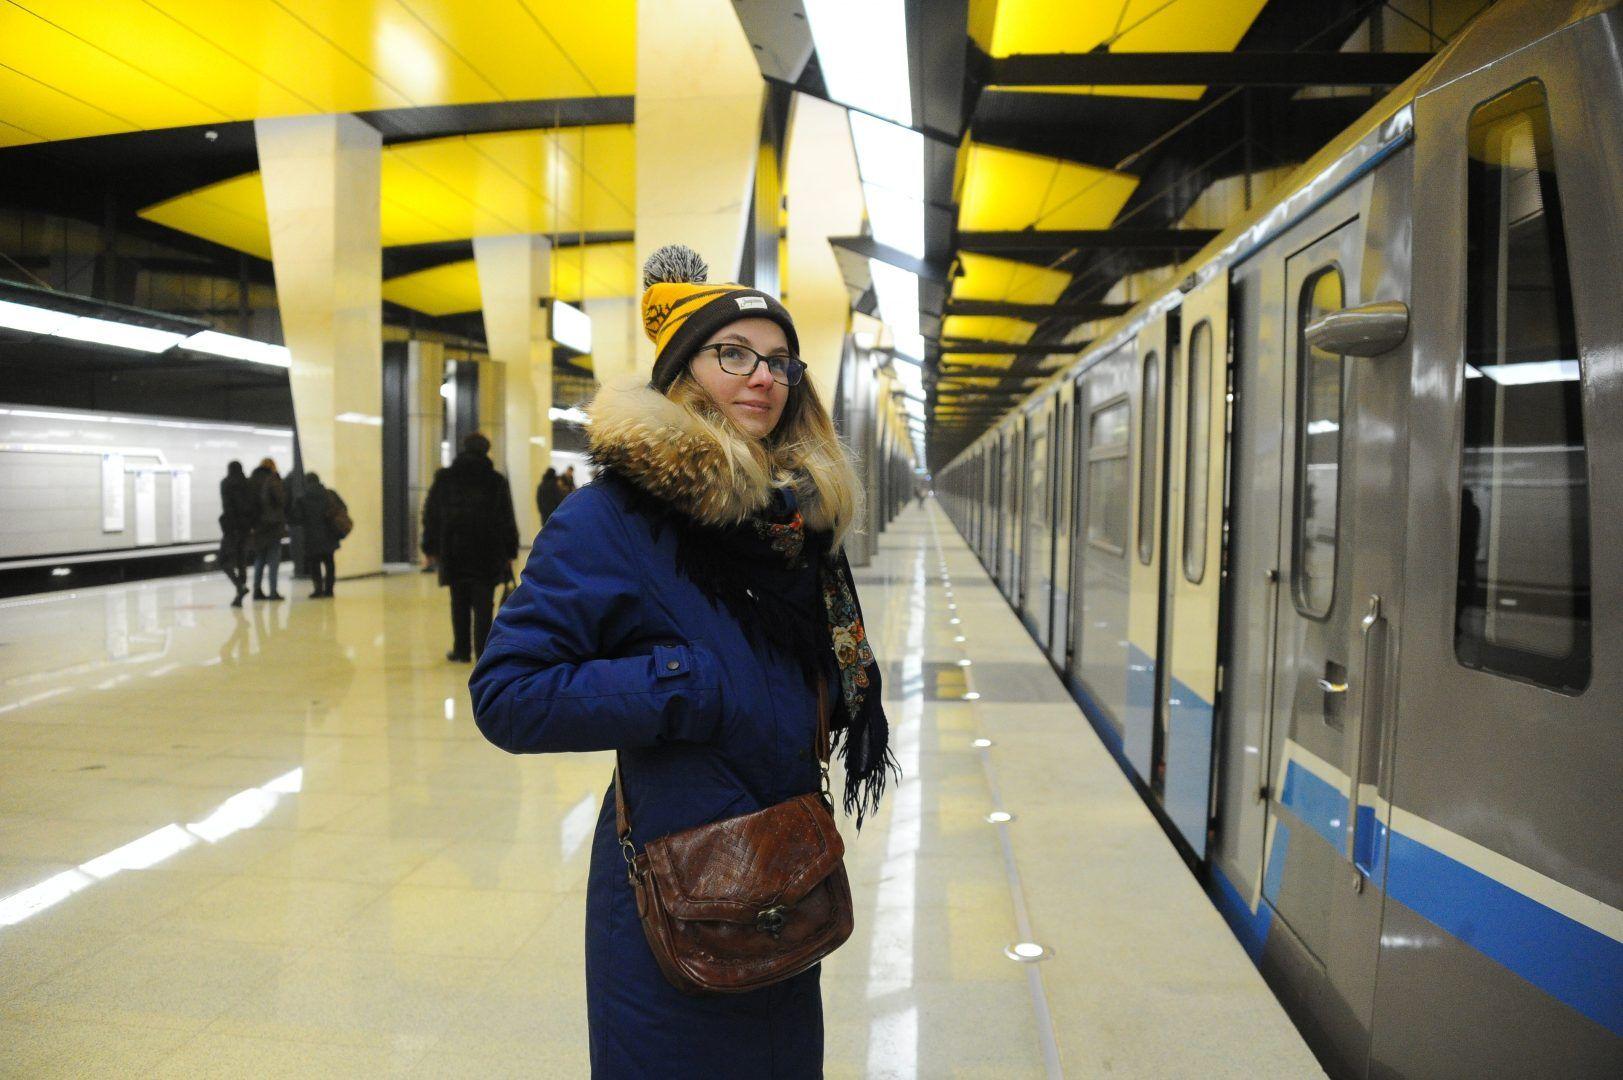 Работу Сокольнической линии метрополитена возобновили в столице. Фото: Светлана Колоскова, «Вечерняя Москва»